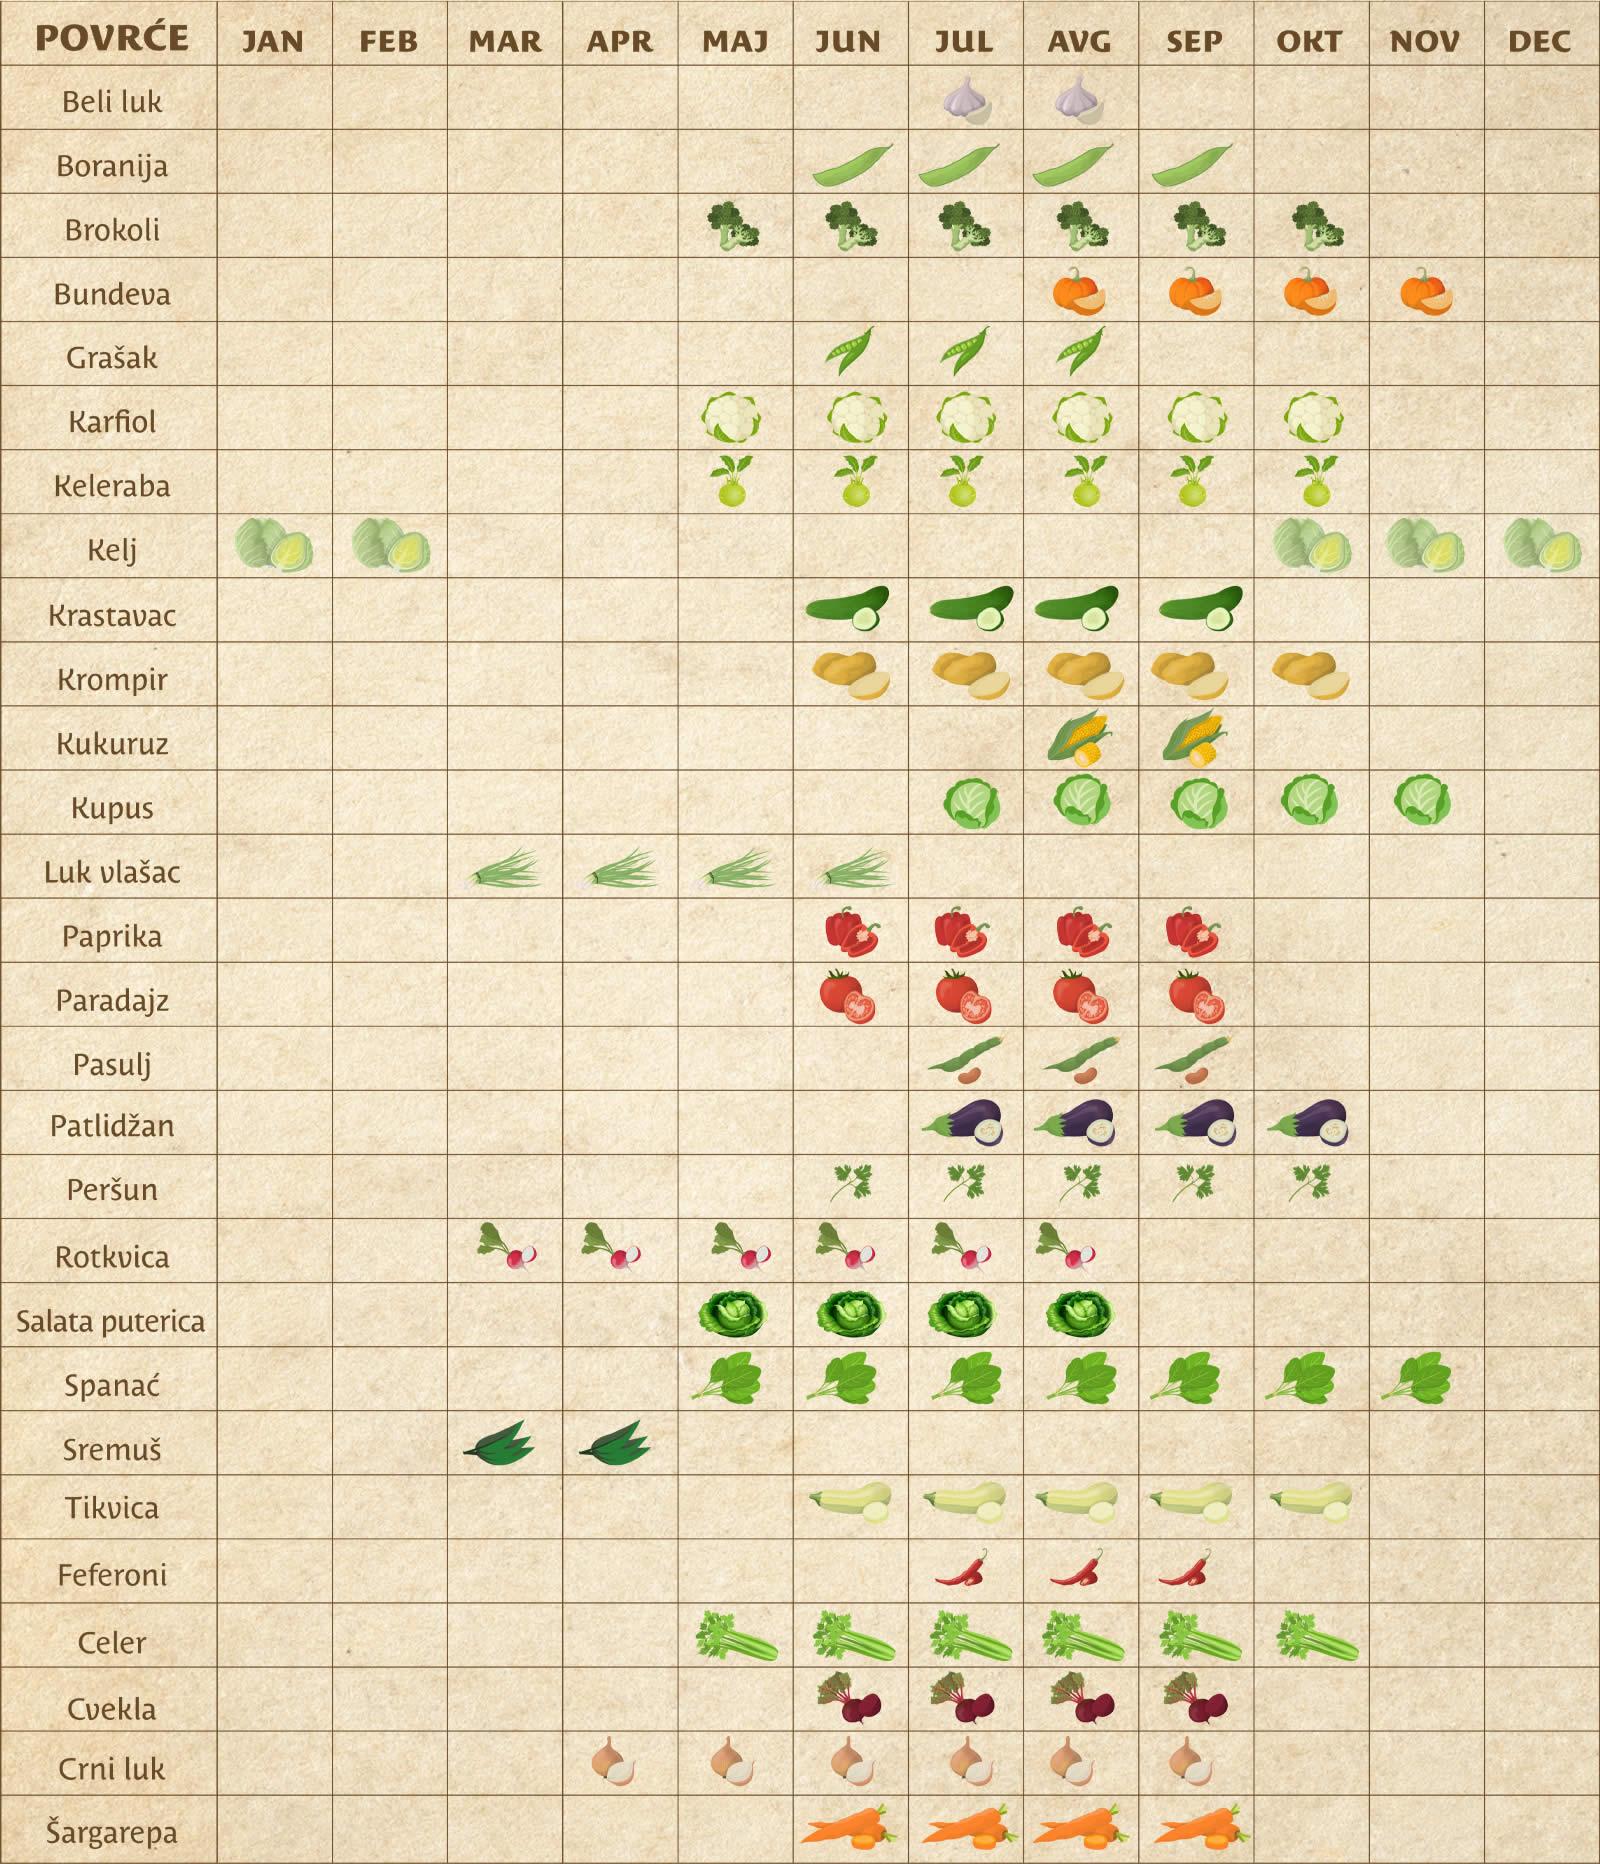 Kalendar povrća